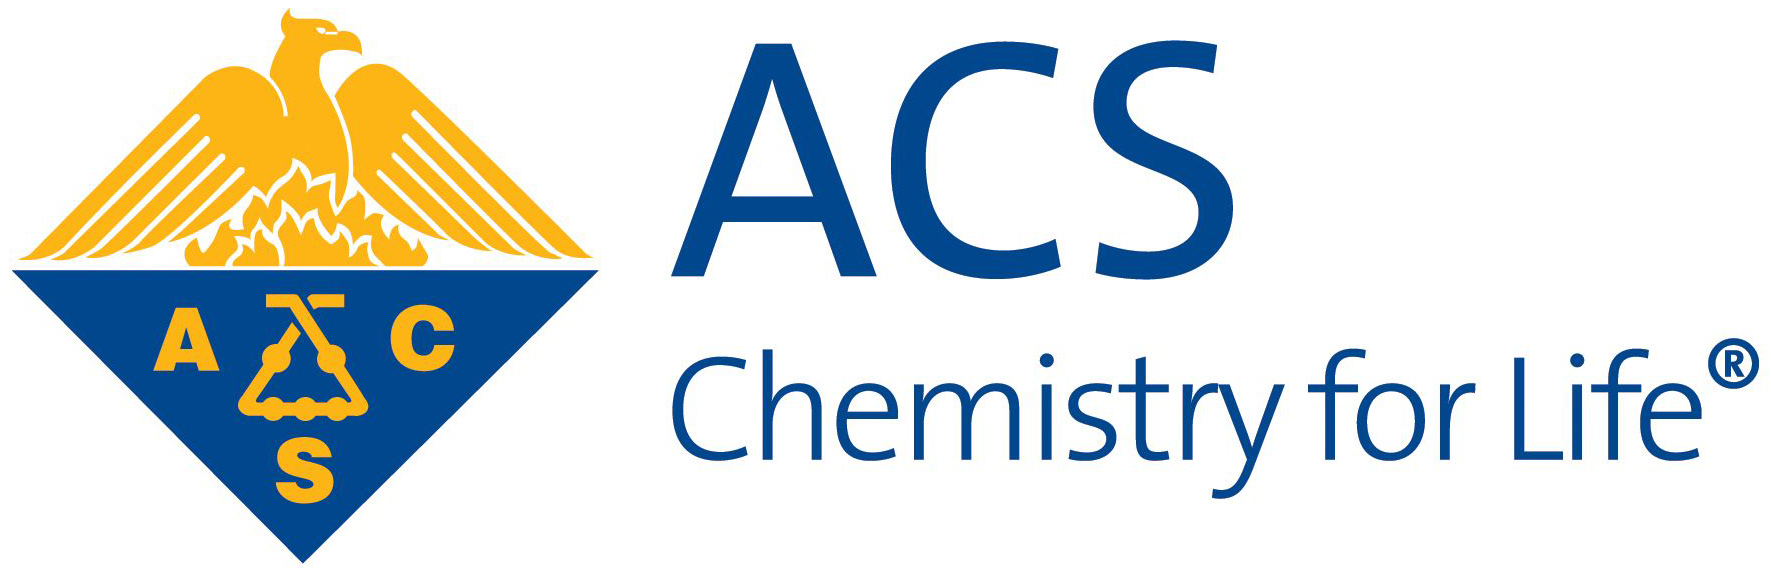 ACS-logo.jpg